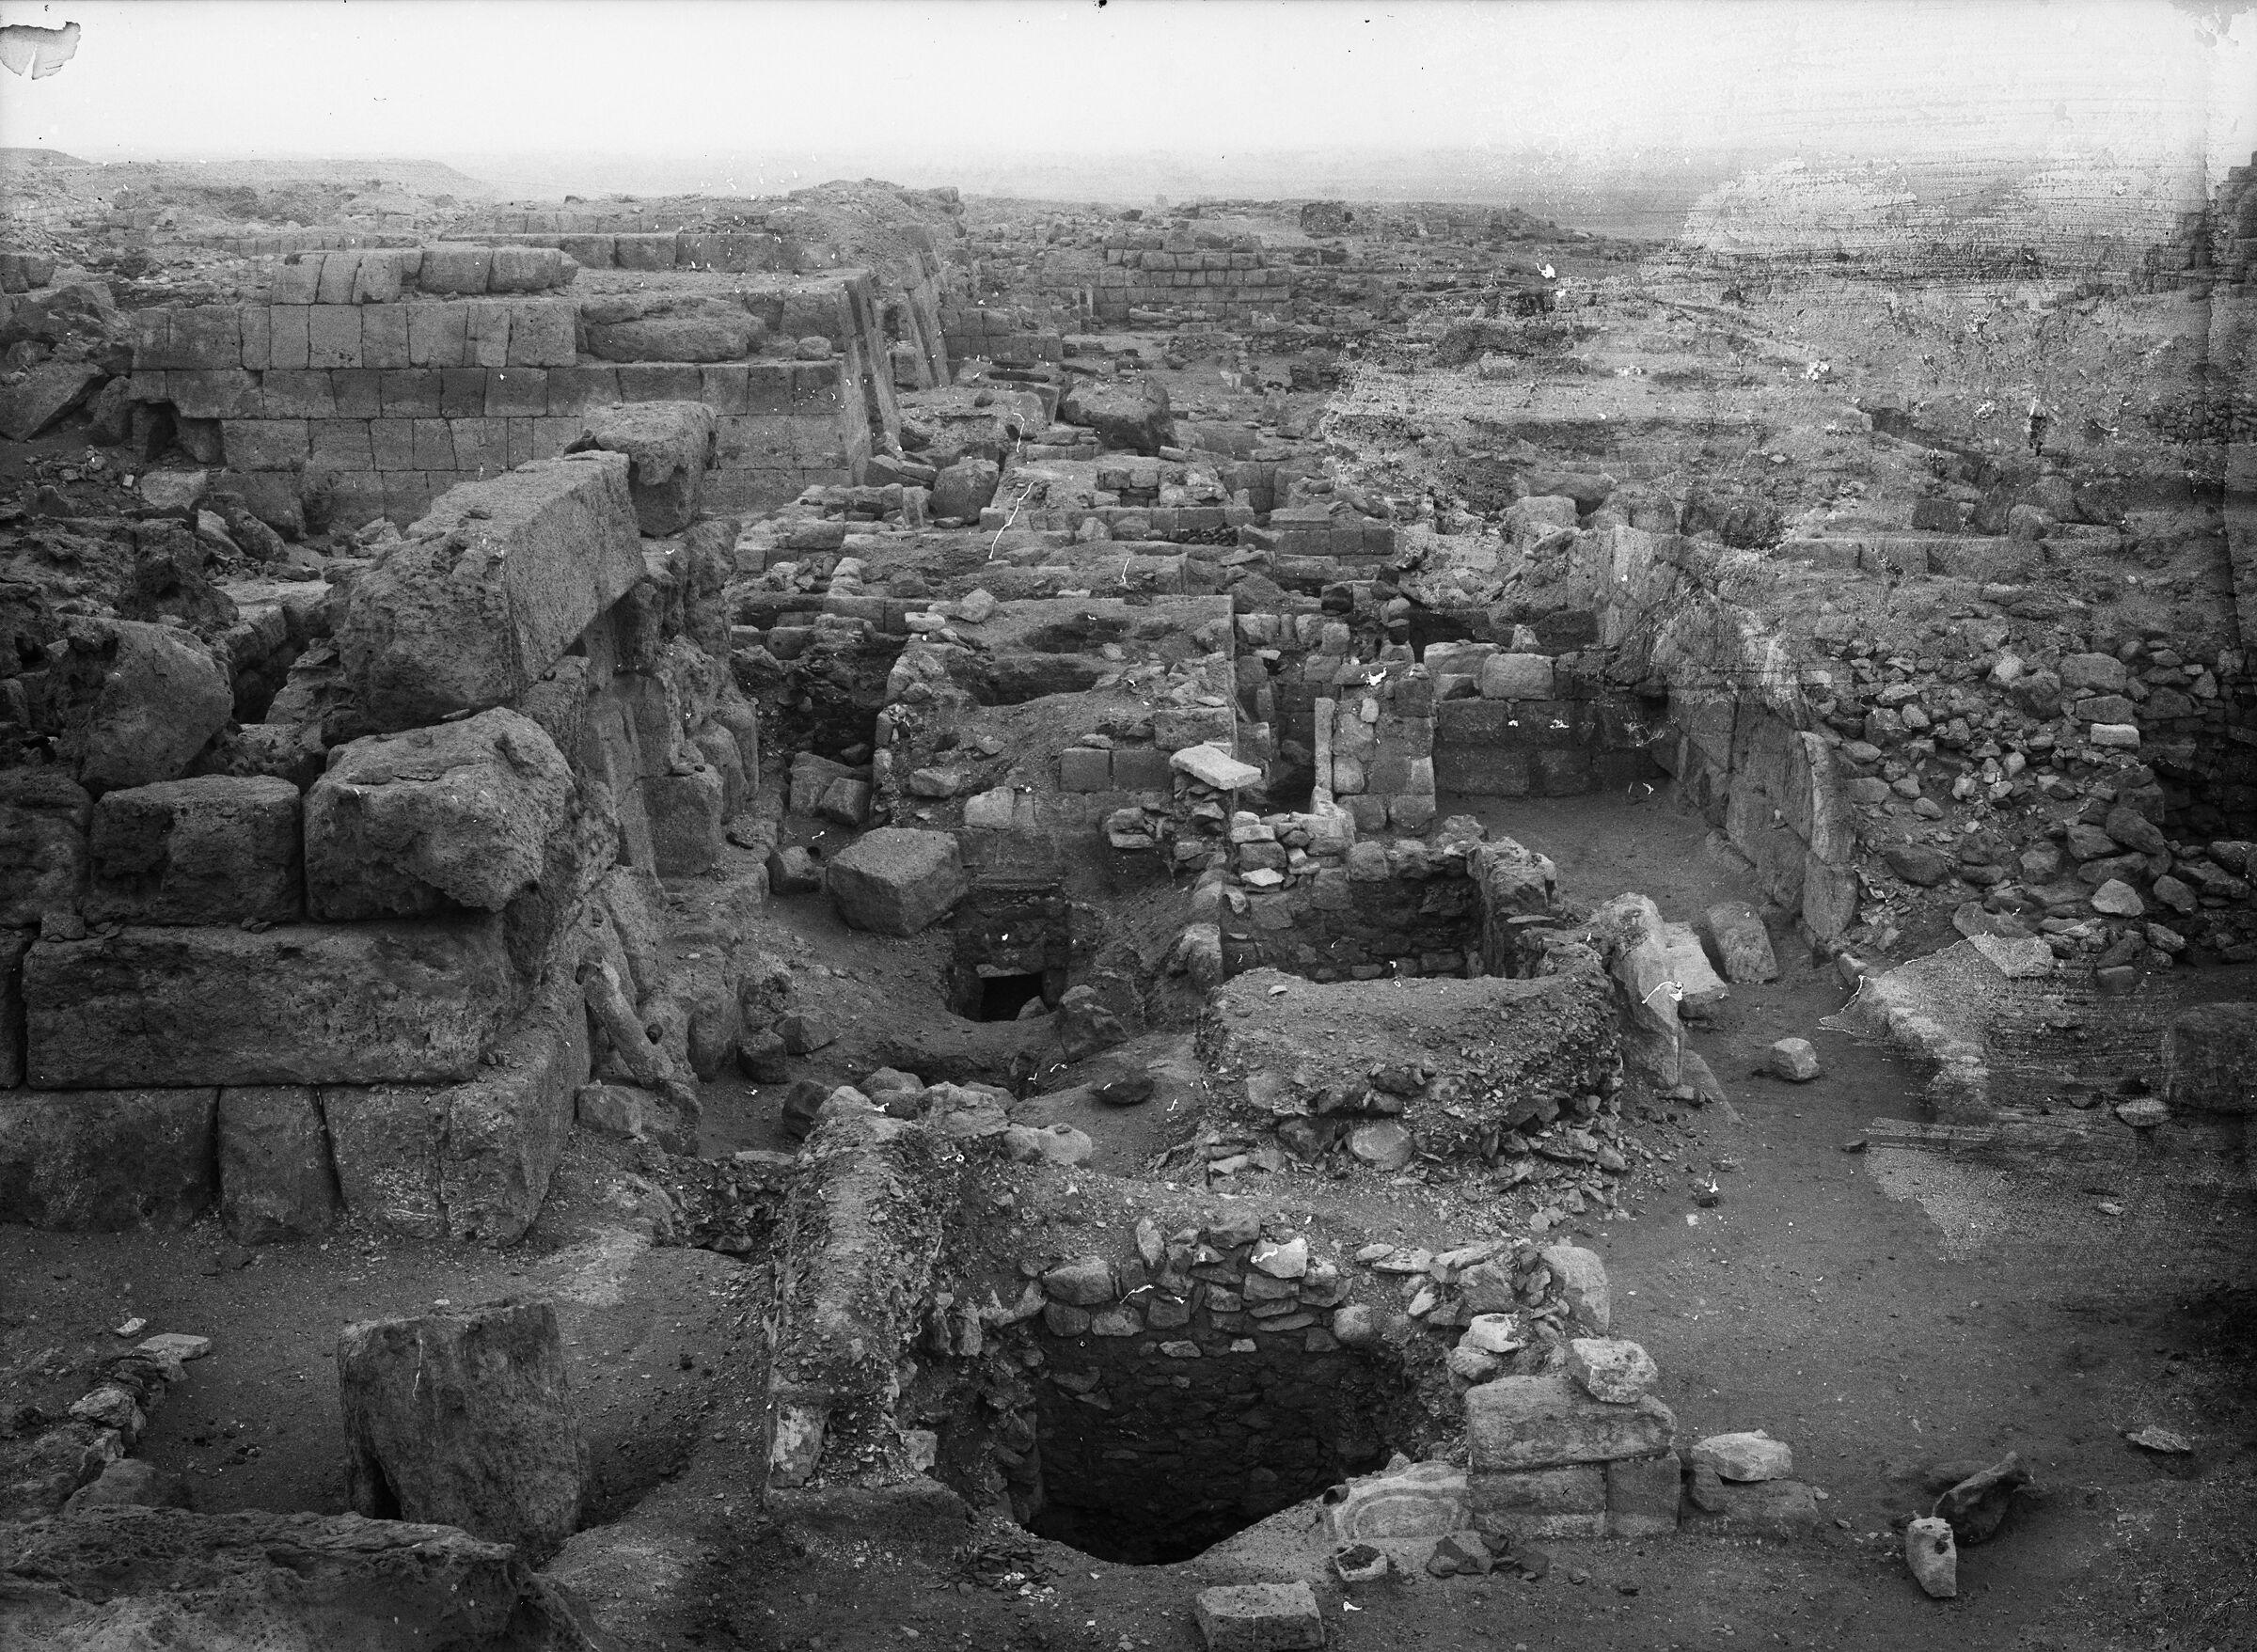 Western Cemetery: Site: Giza; View: G 5230, G 5222, G 5221, G 5228, G 5229, G 5232, G 5233, G 5330